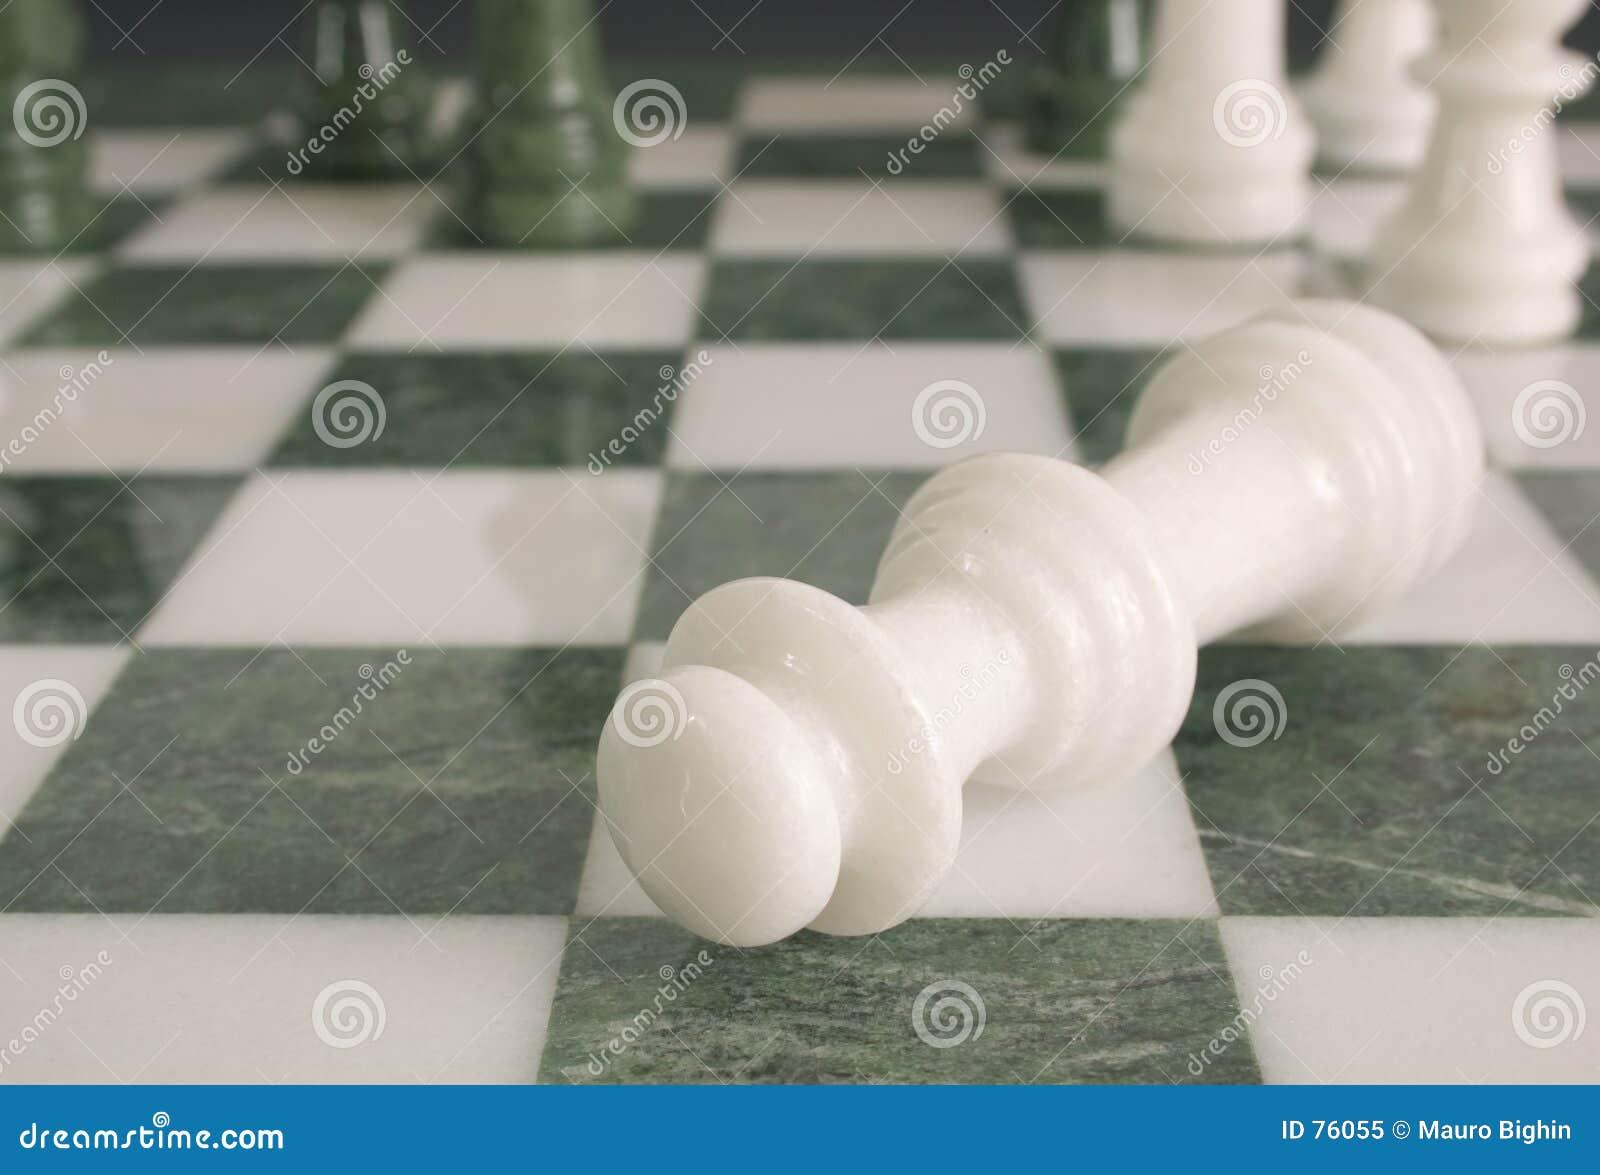 Chessmate σκηνή εγκλήματος